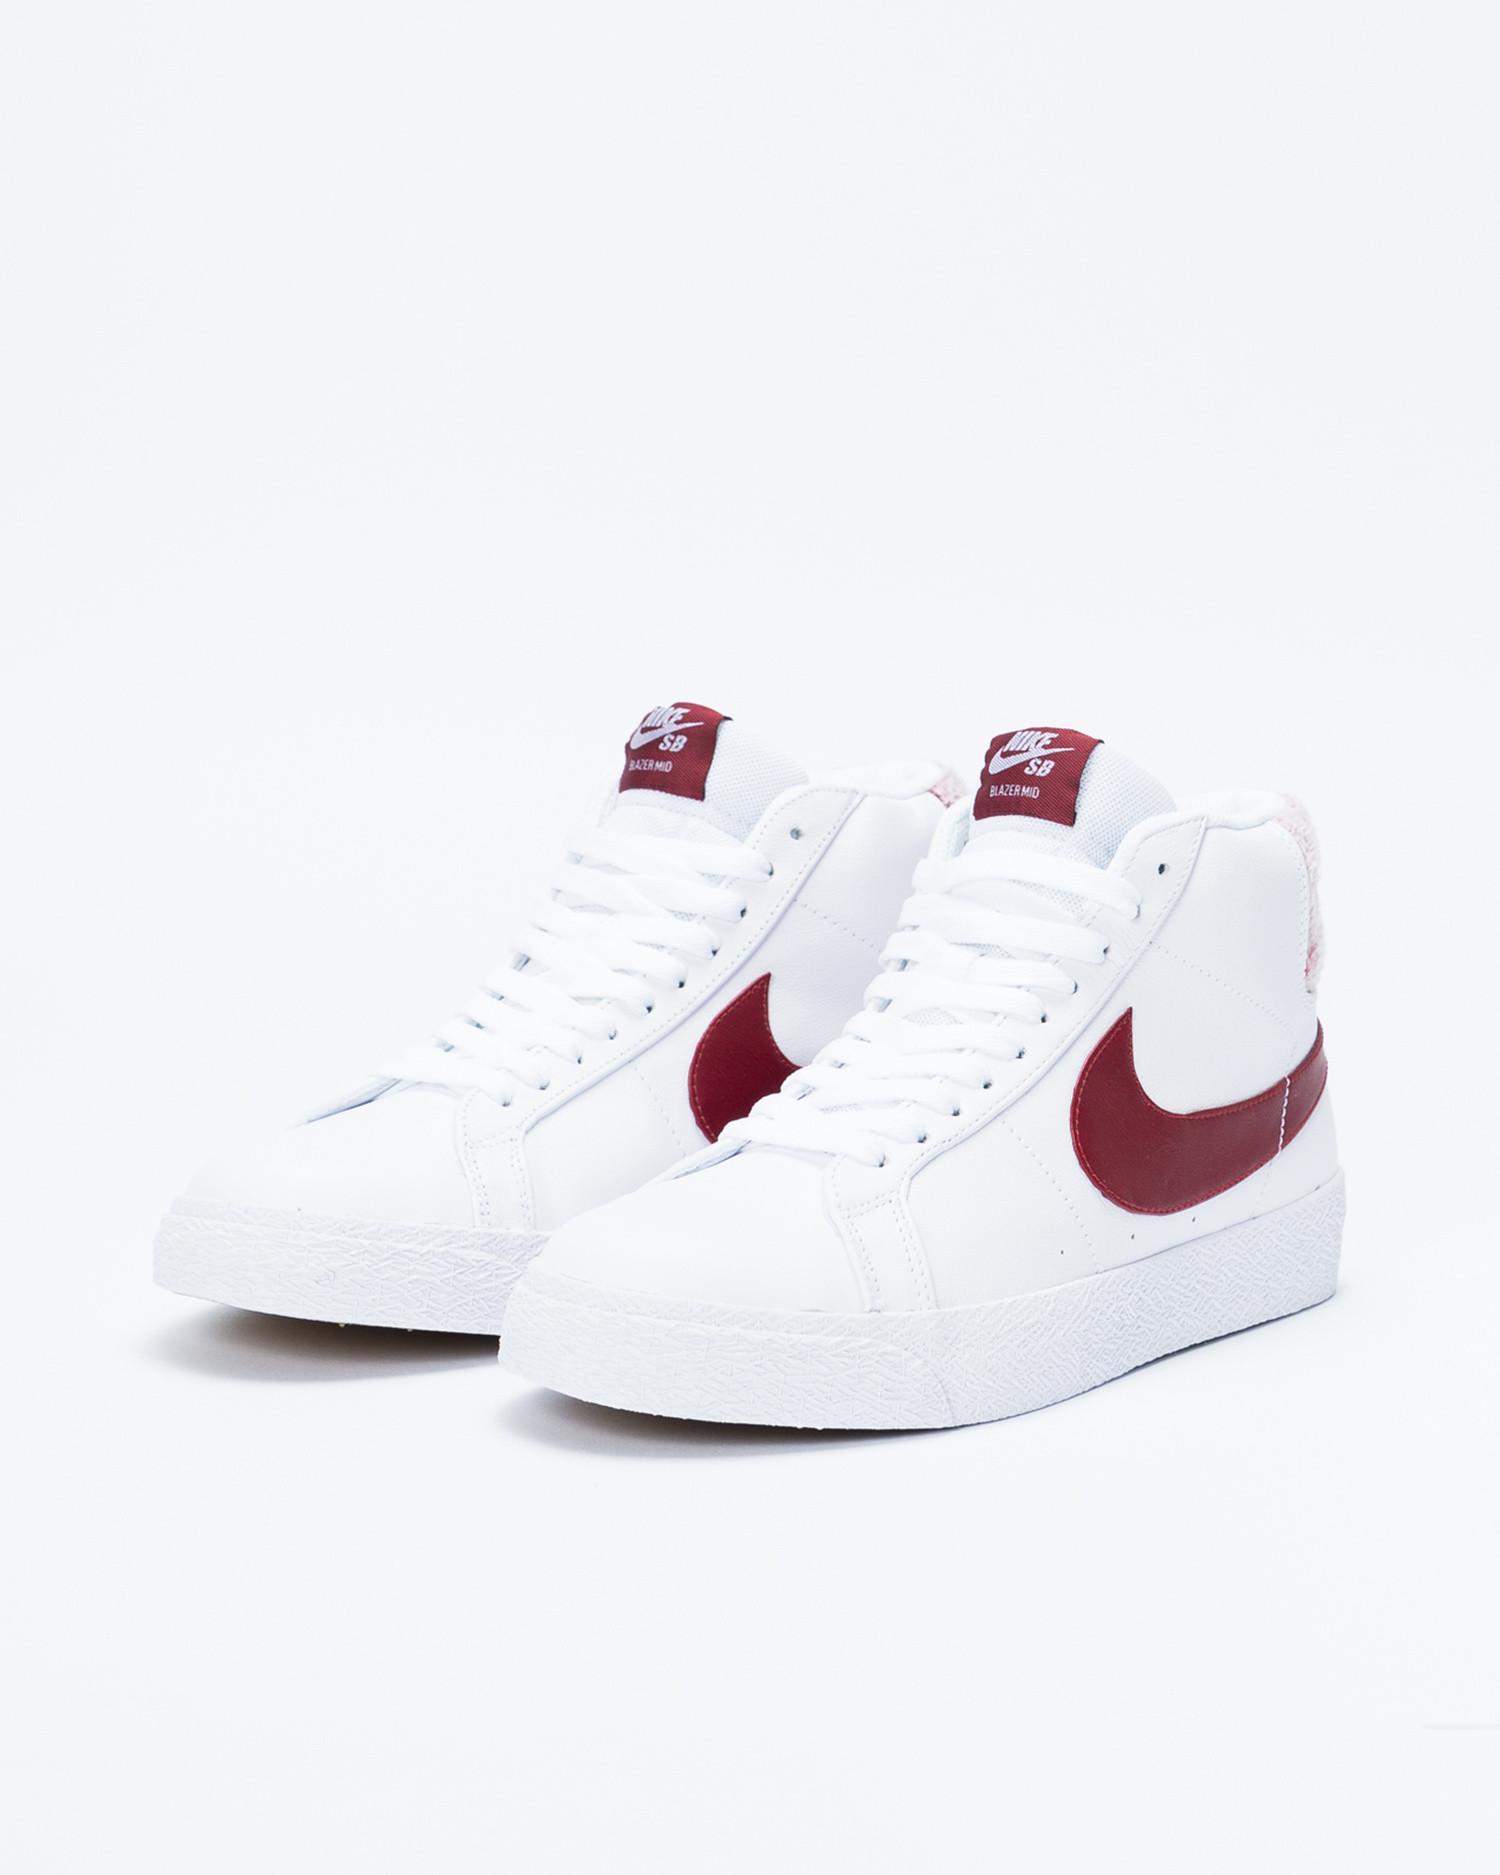 Nike SB Zoom Blazer Mid Premium White/Team Red